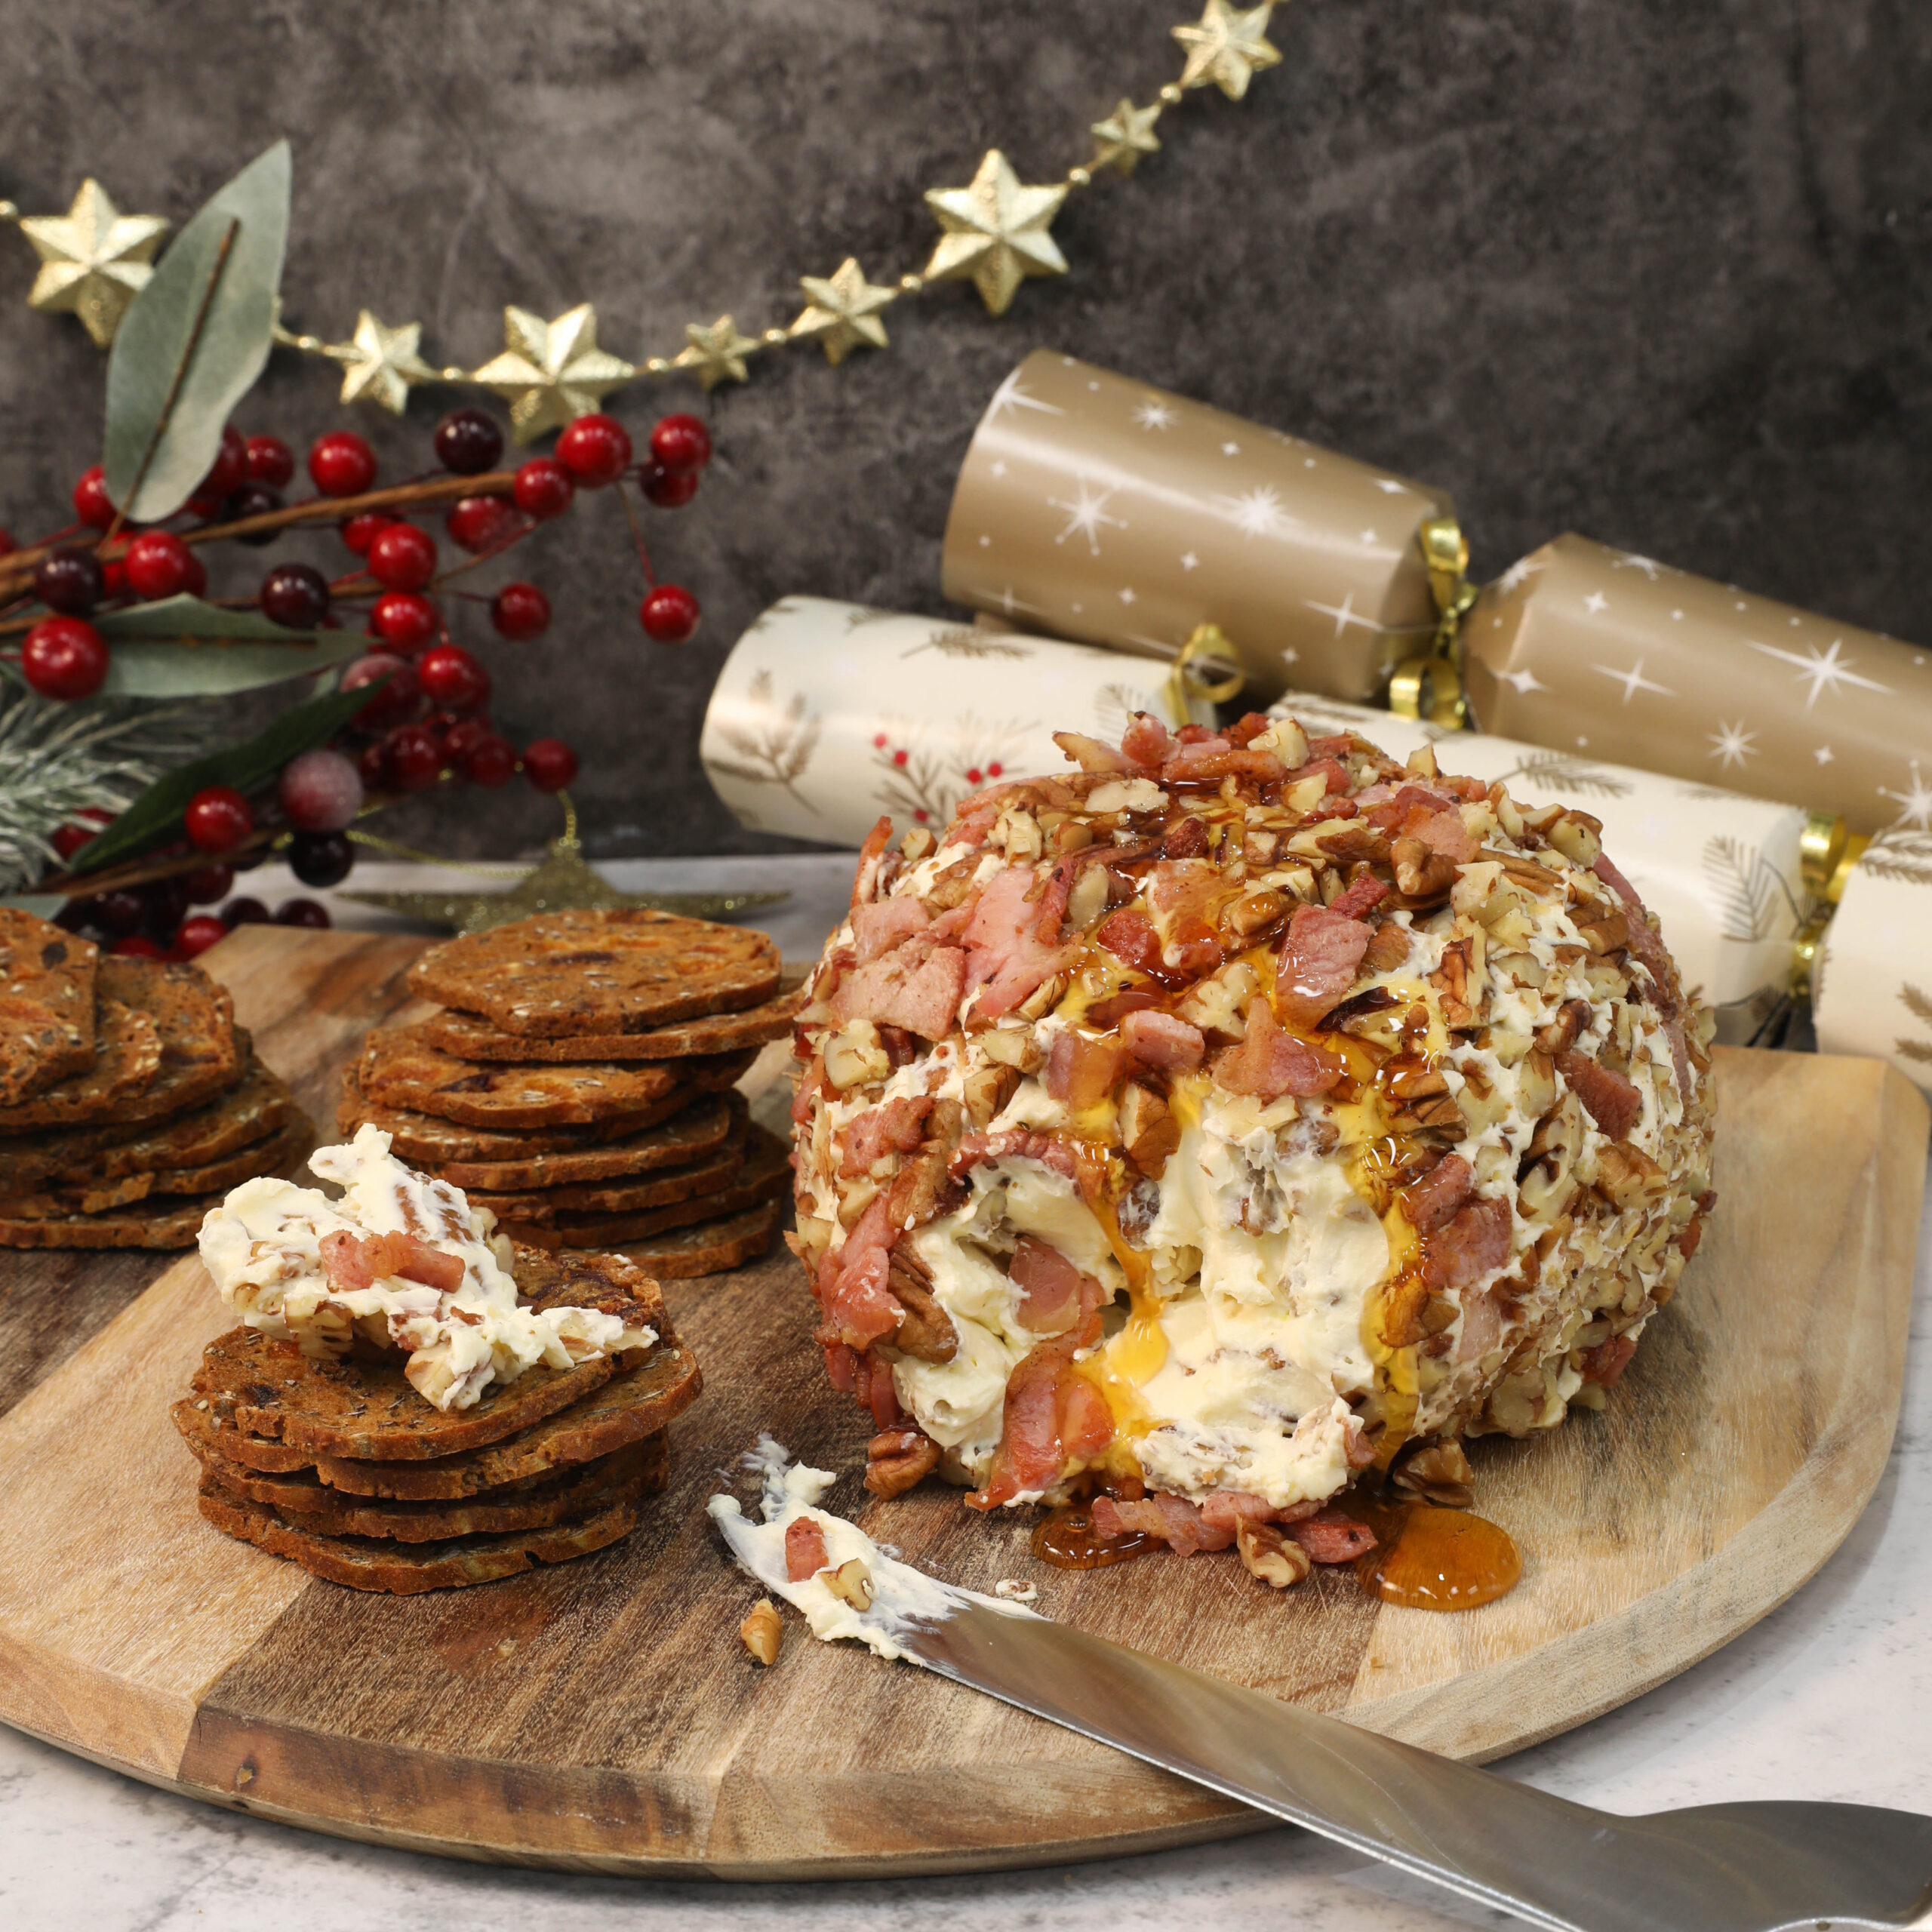 Bacon,maple and pecan cheeseball